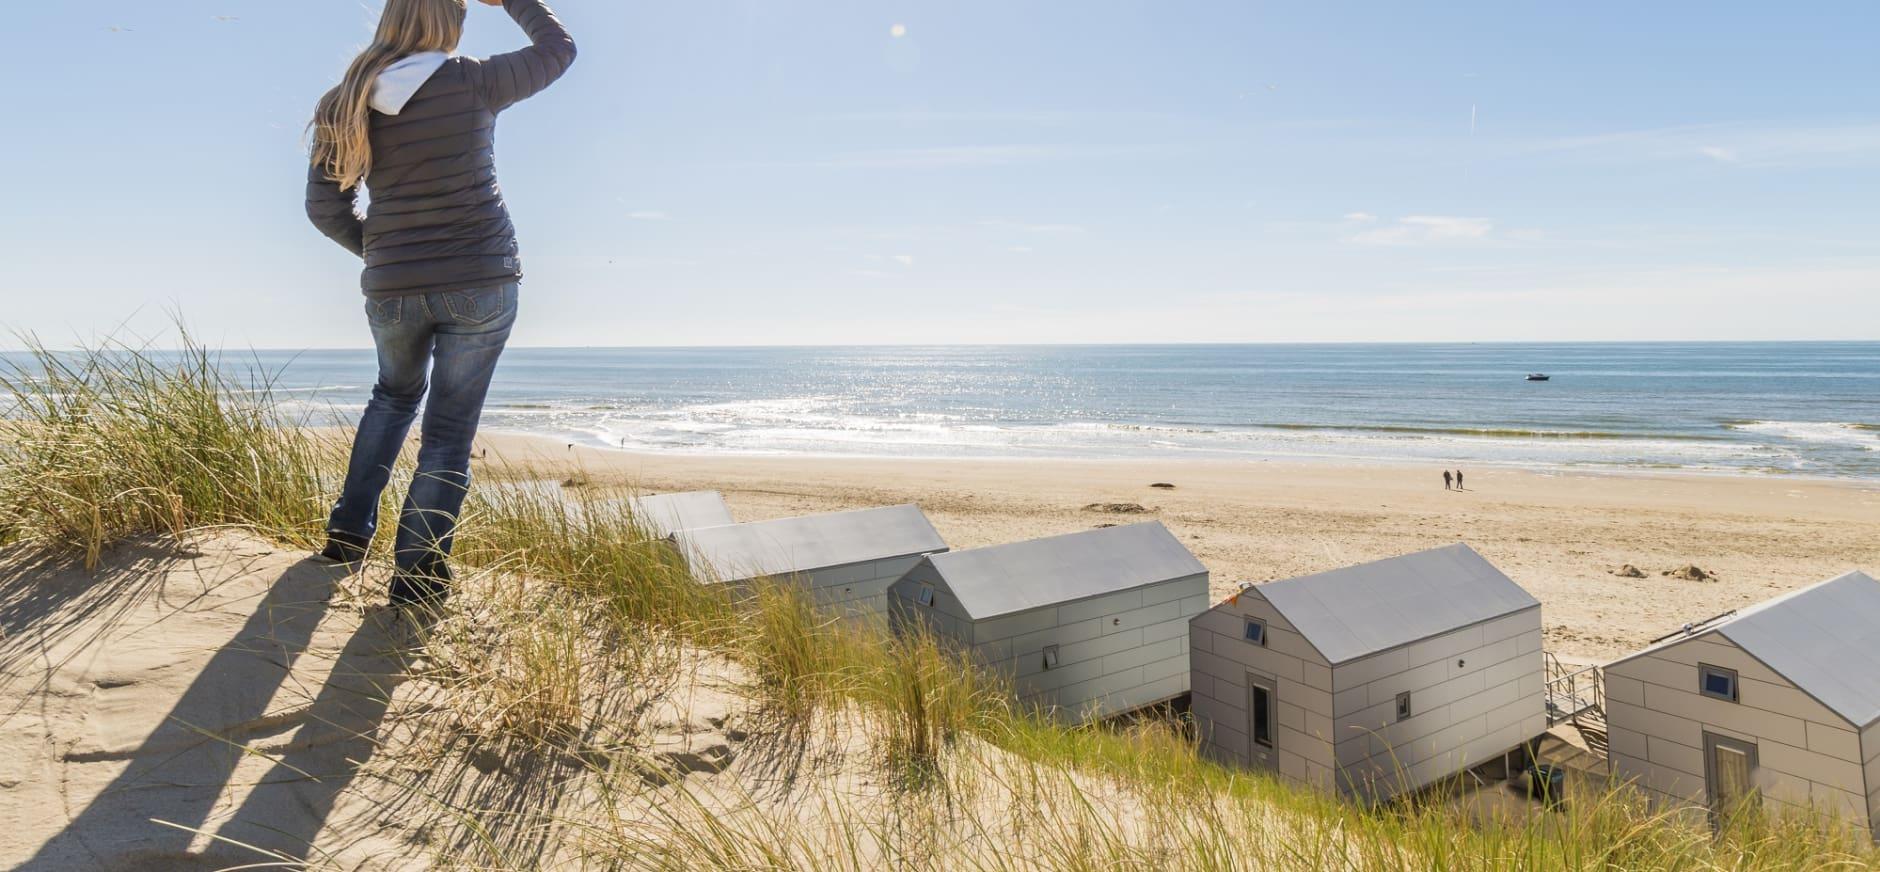 Uitzicht strandhuisjes bescherm de kust